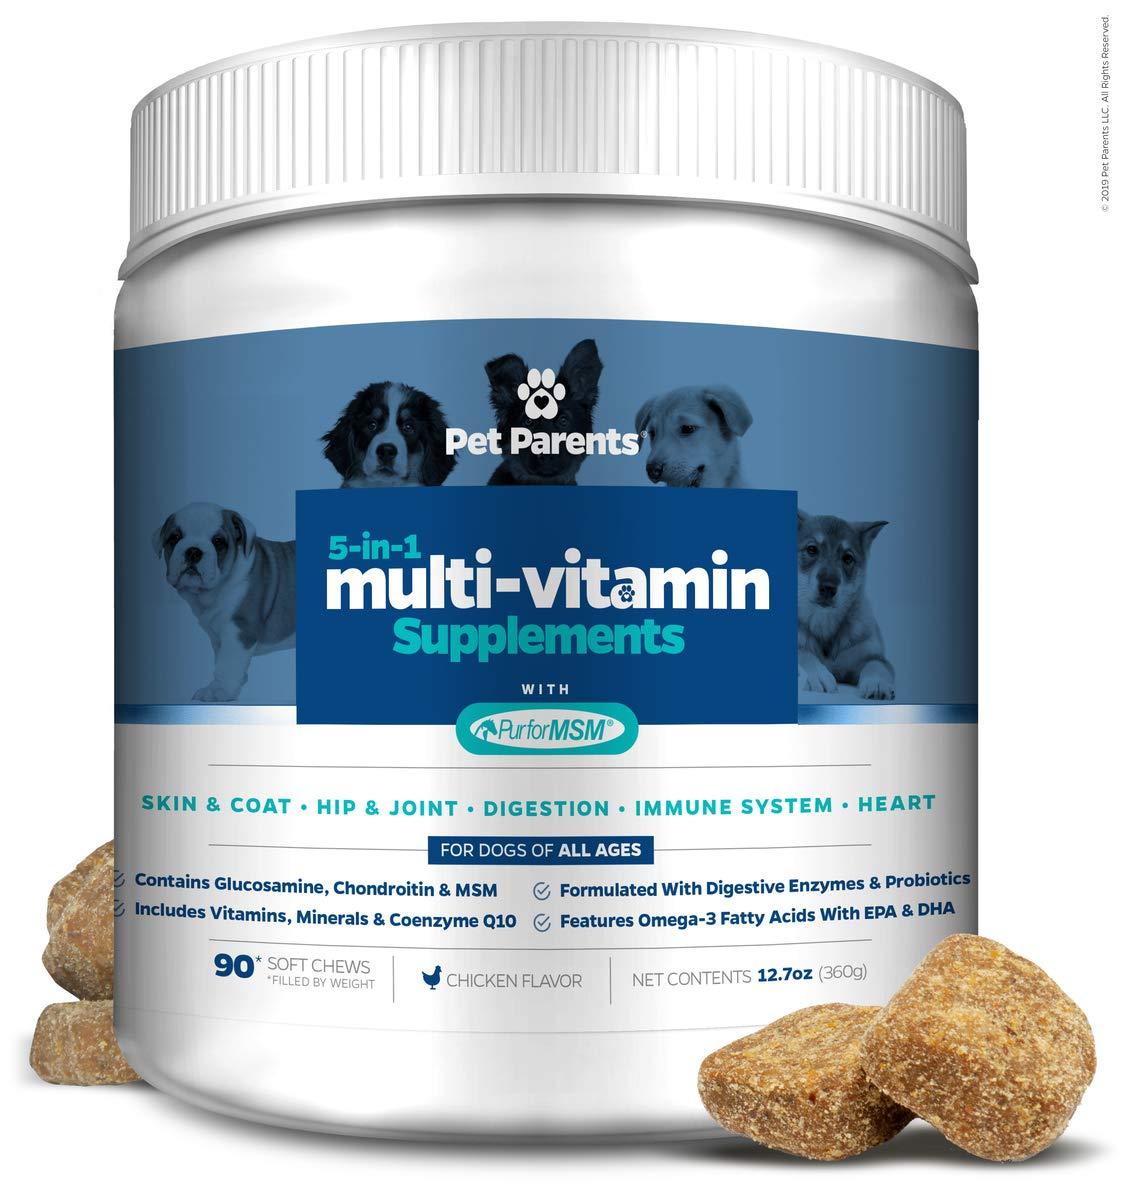 Pet Parents USA Dog Multivitamin 4g 90c- Omega 3 For Dogs Glucosamine for Dogs Dog Probiotics MSM for Dogs, Multivitamin for Dogs, Dog Vitamins Dog Immunity, Vitamins For Dogs Puppy Vitamins